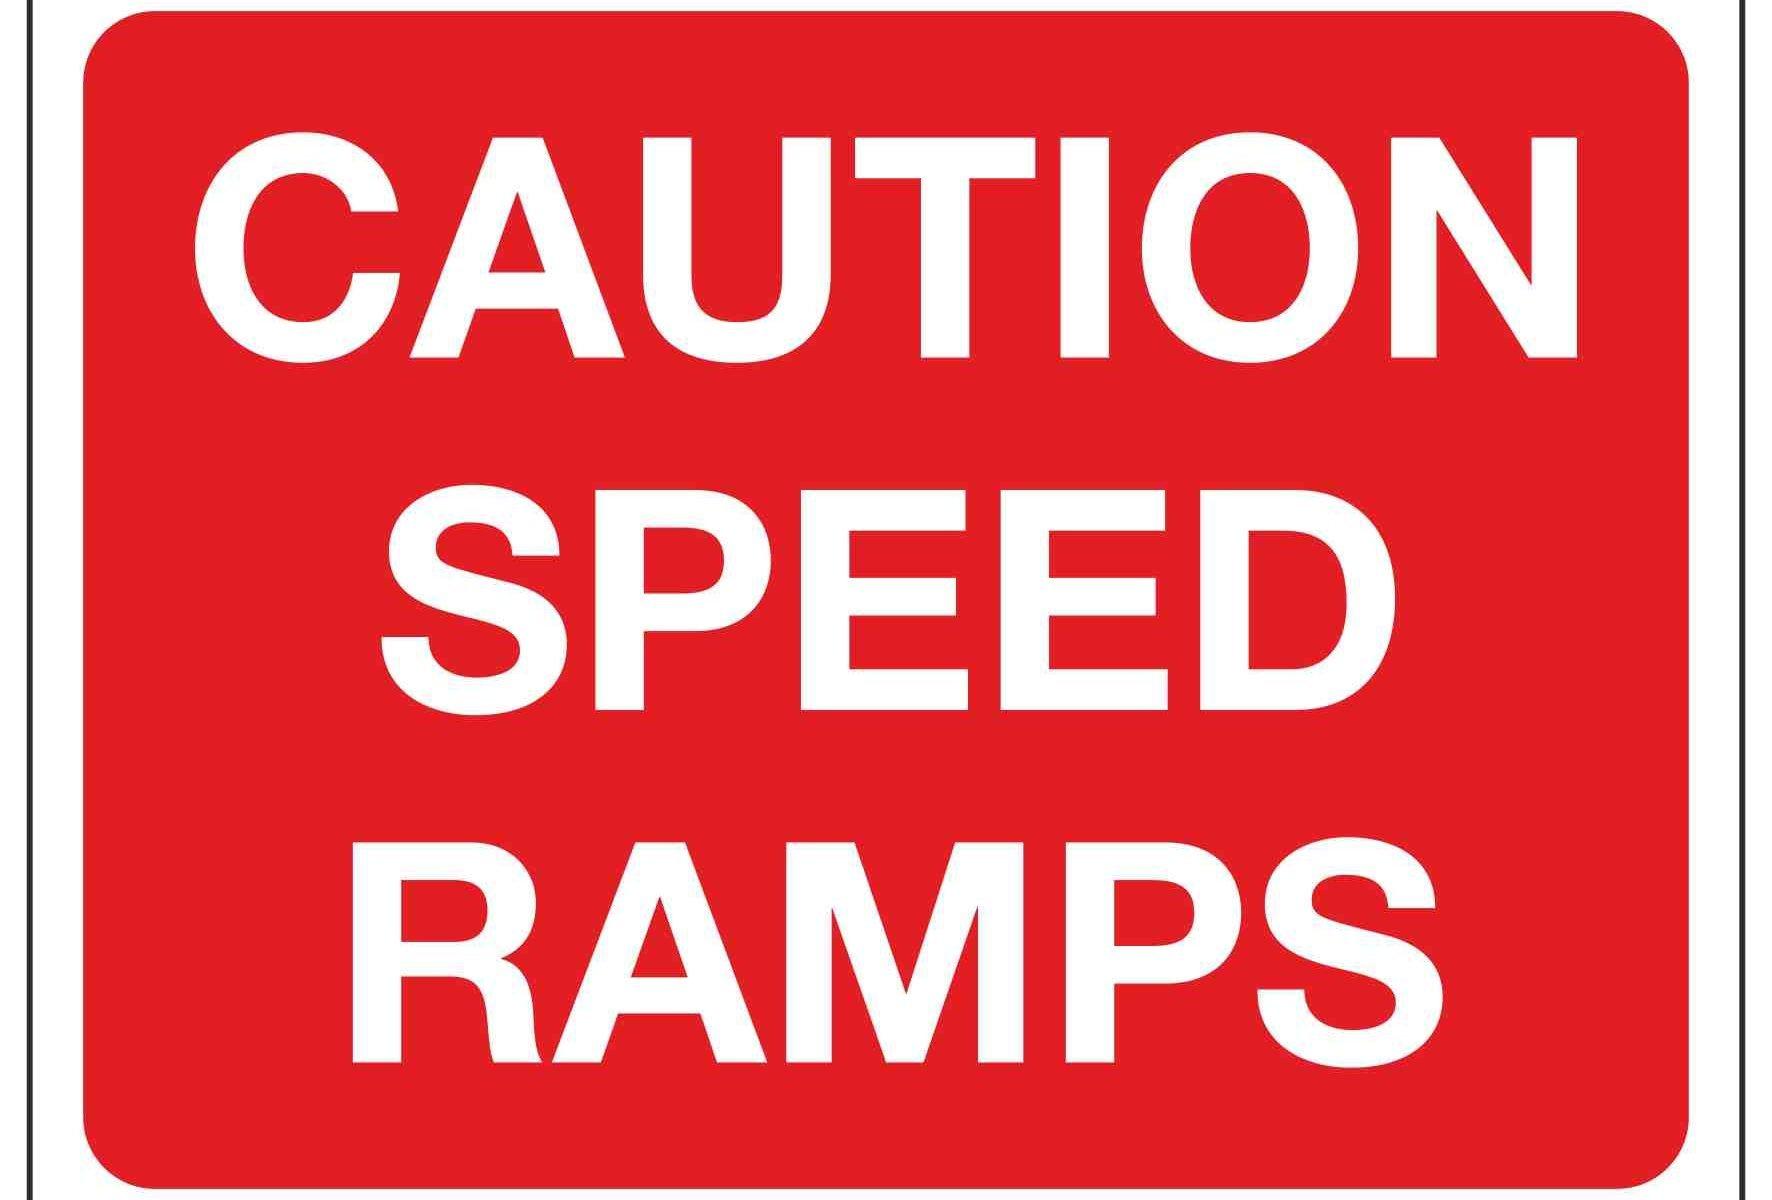 CAUTION SPEED RAMPS